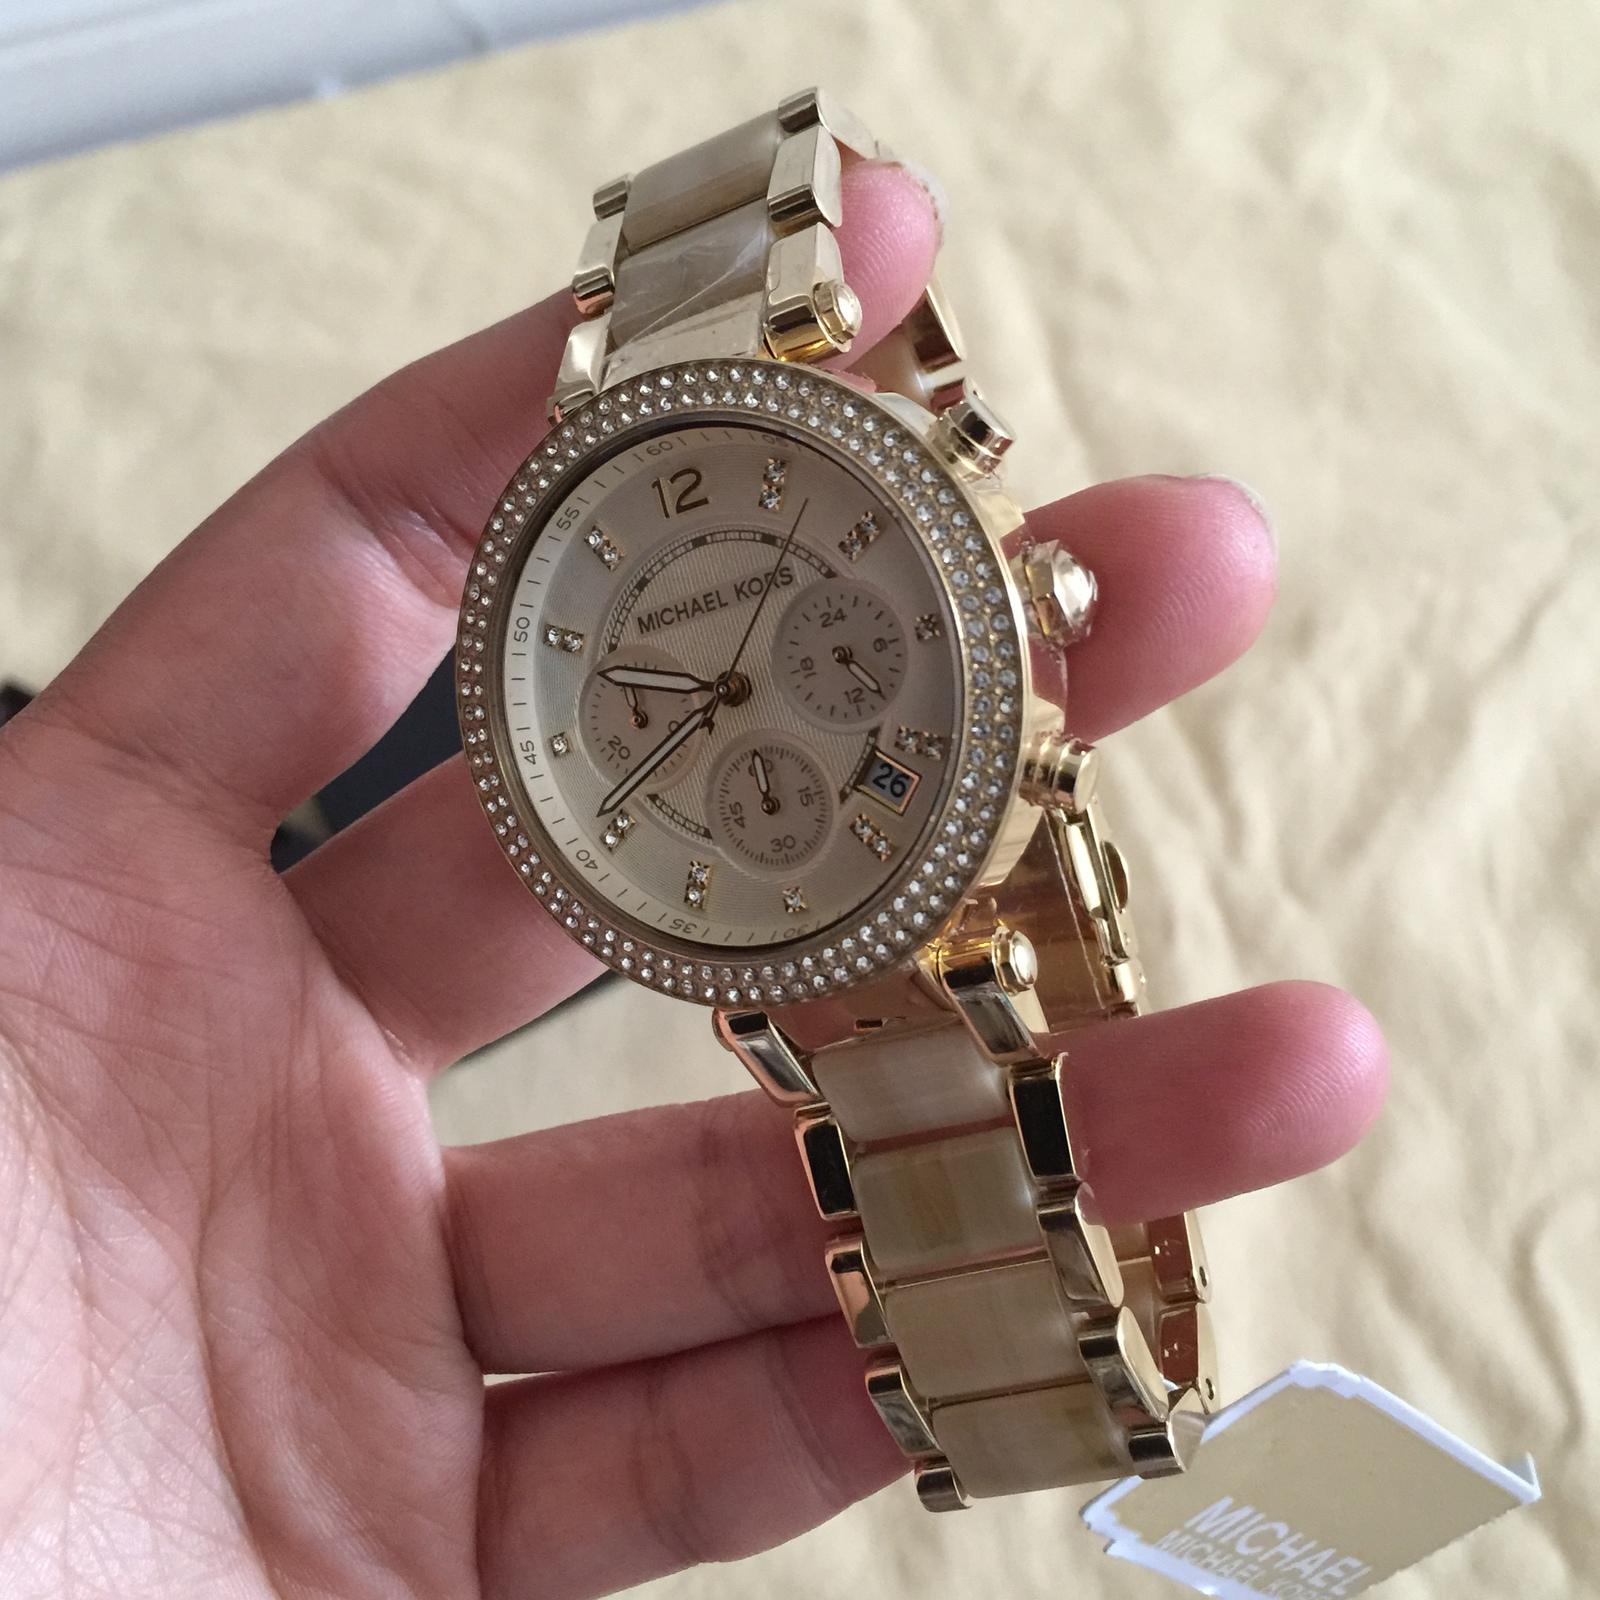 f2e5e0ef09ef NWT MICHAEL KORS Chronograph Parker Horn Acetate and Gold-Tone Watch MK5632